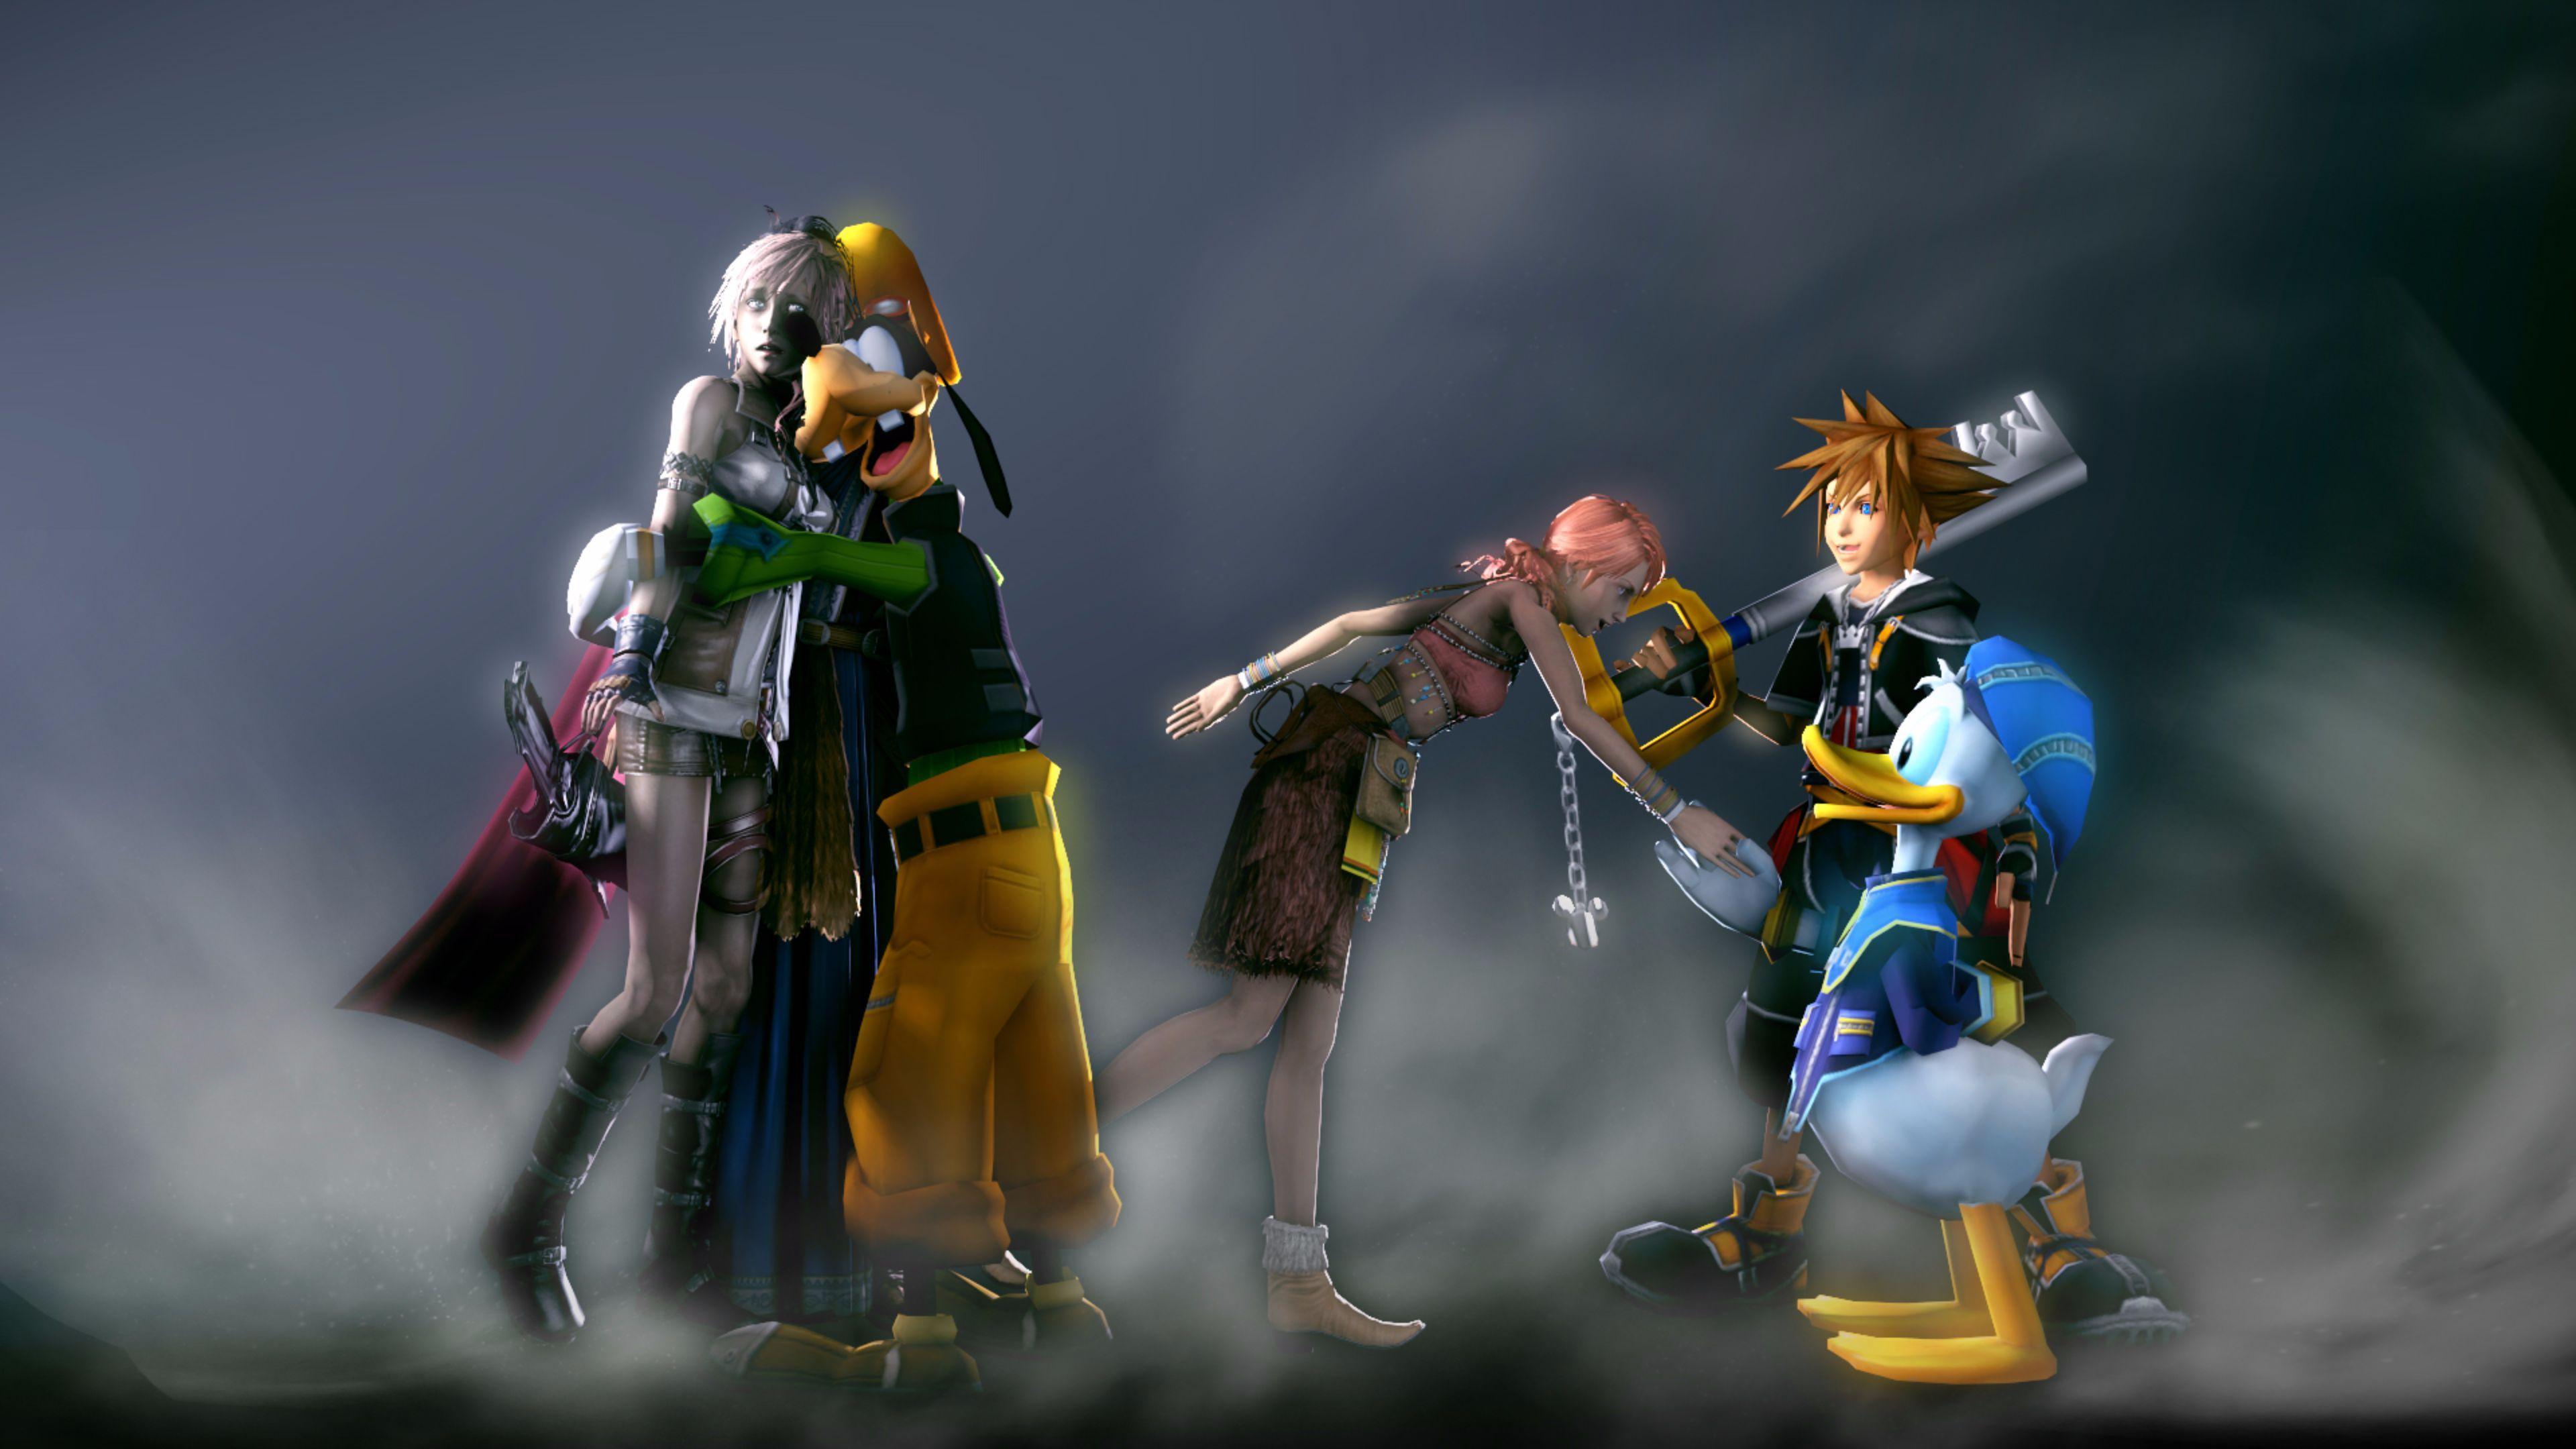 Kingdom Hearts 3 Widescreen Wallpaper 67190 3840x2160px